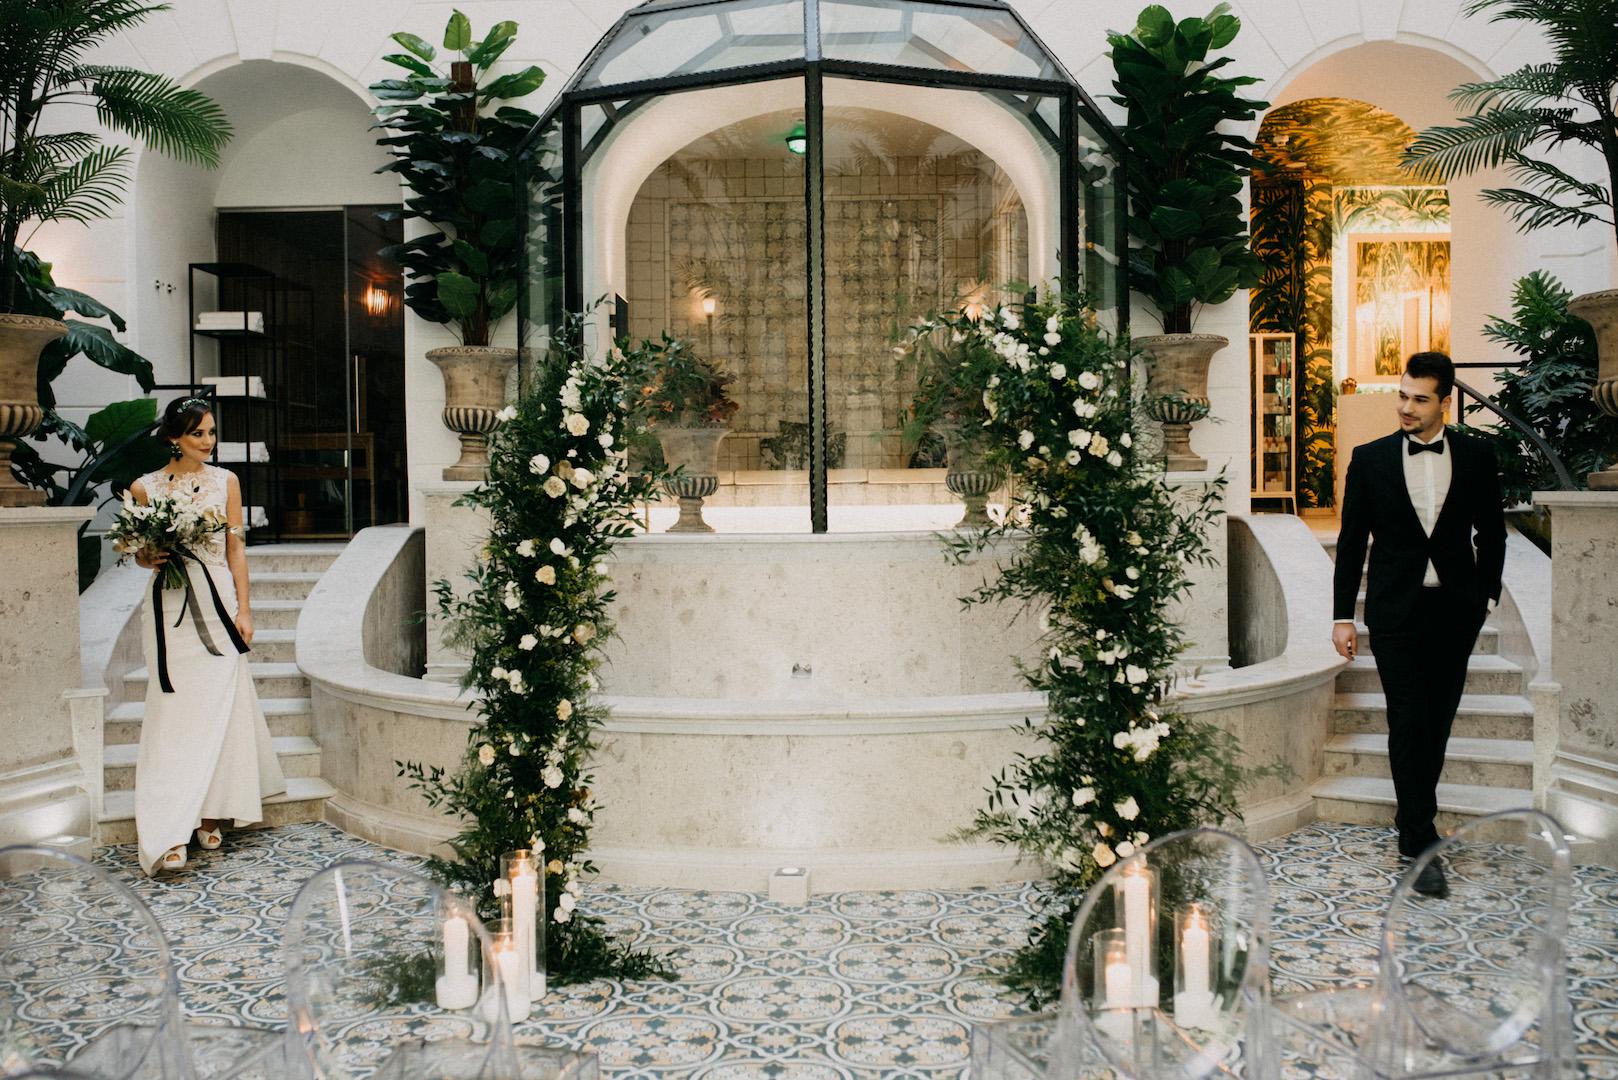 the_great_gatsby_wedding_kfx_1328_1.jpg